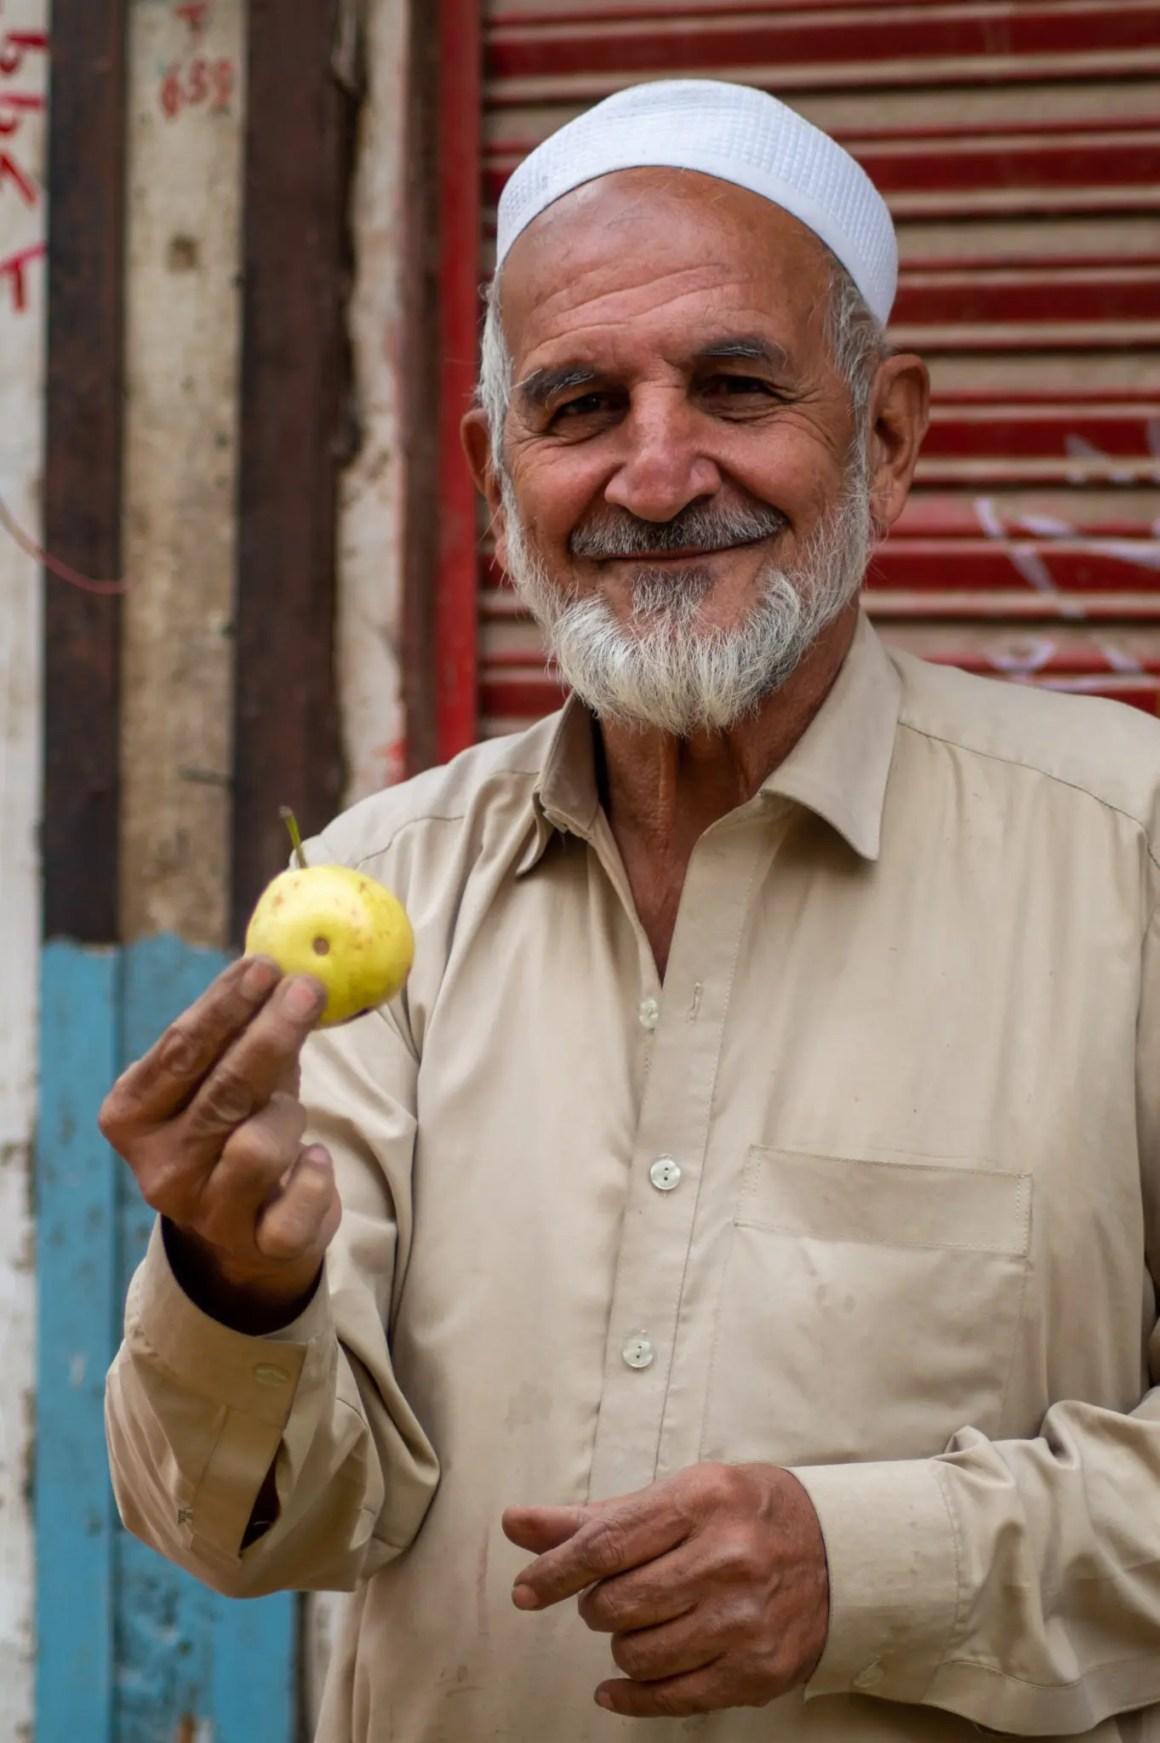 Fruitverkoper in Peshawar